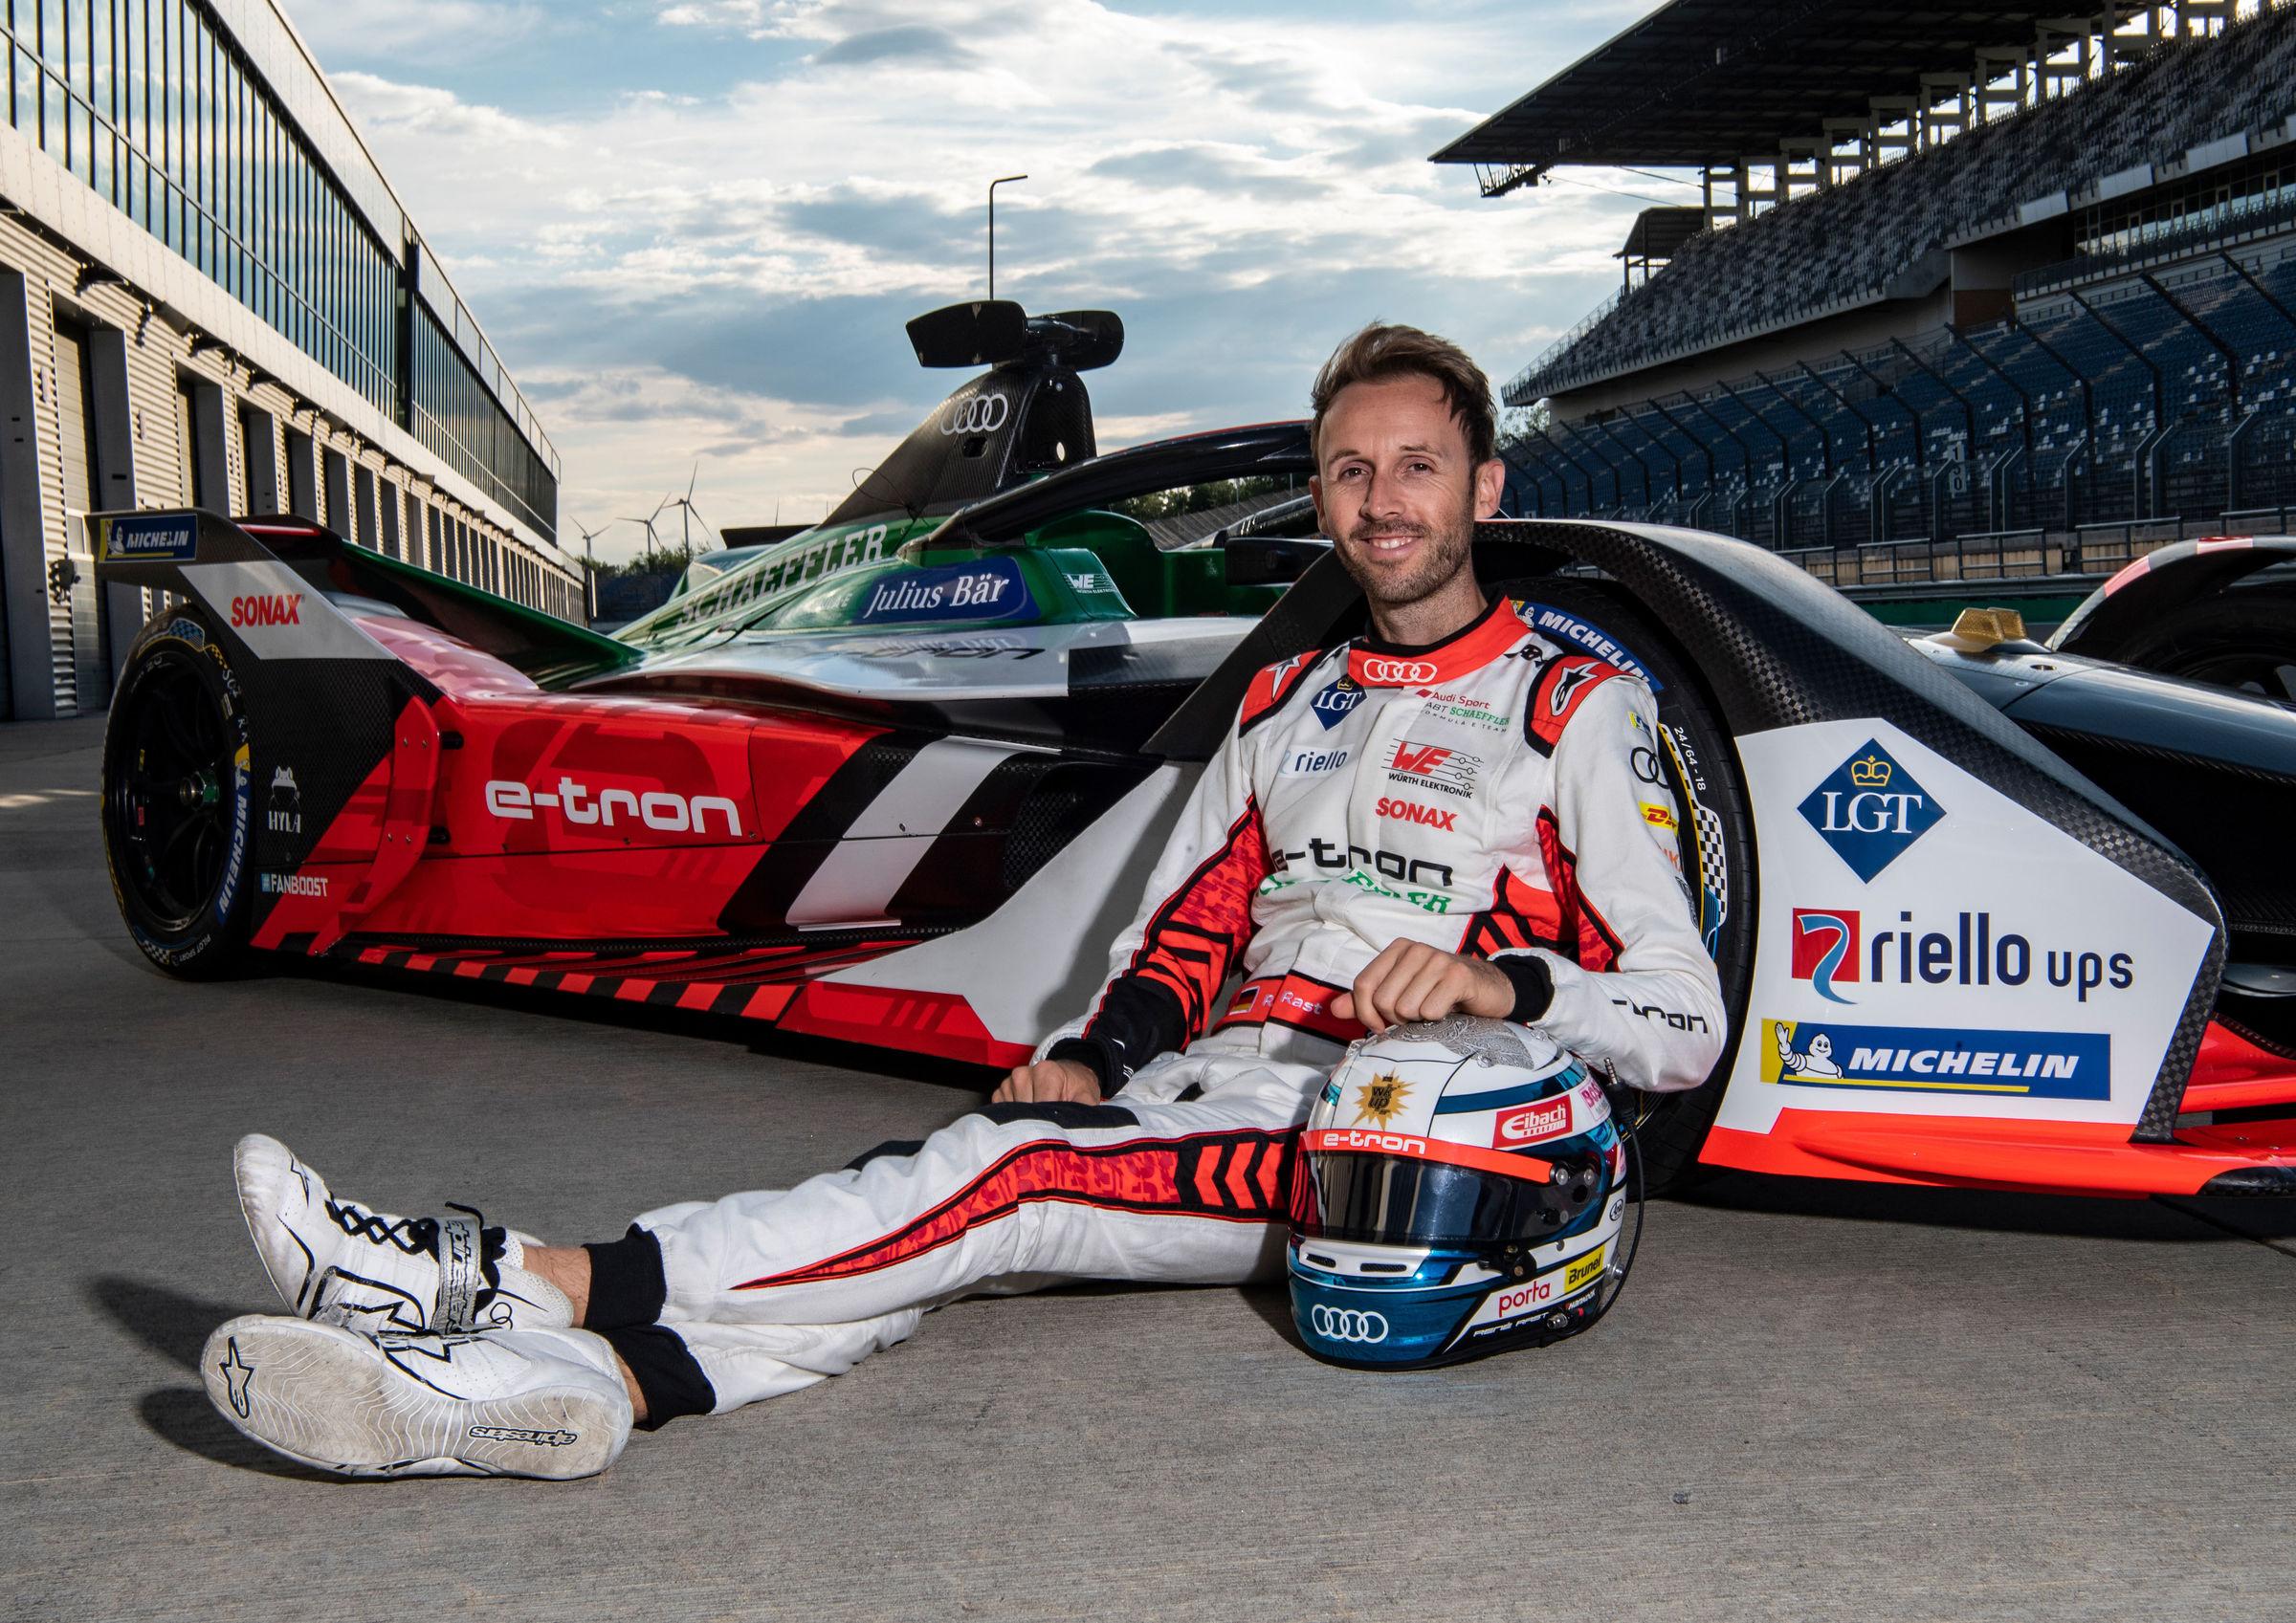 René Rast zum ersten Mal im Formel-E-Audi